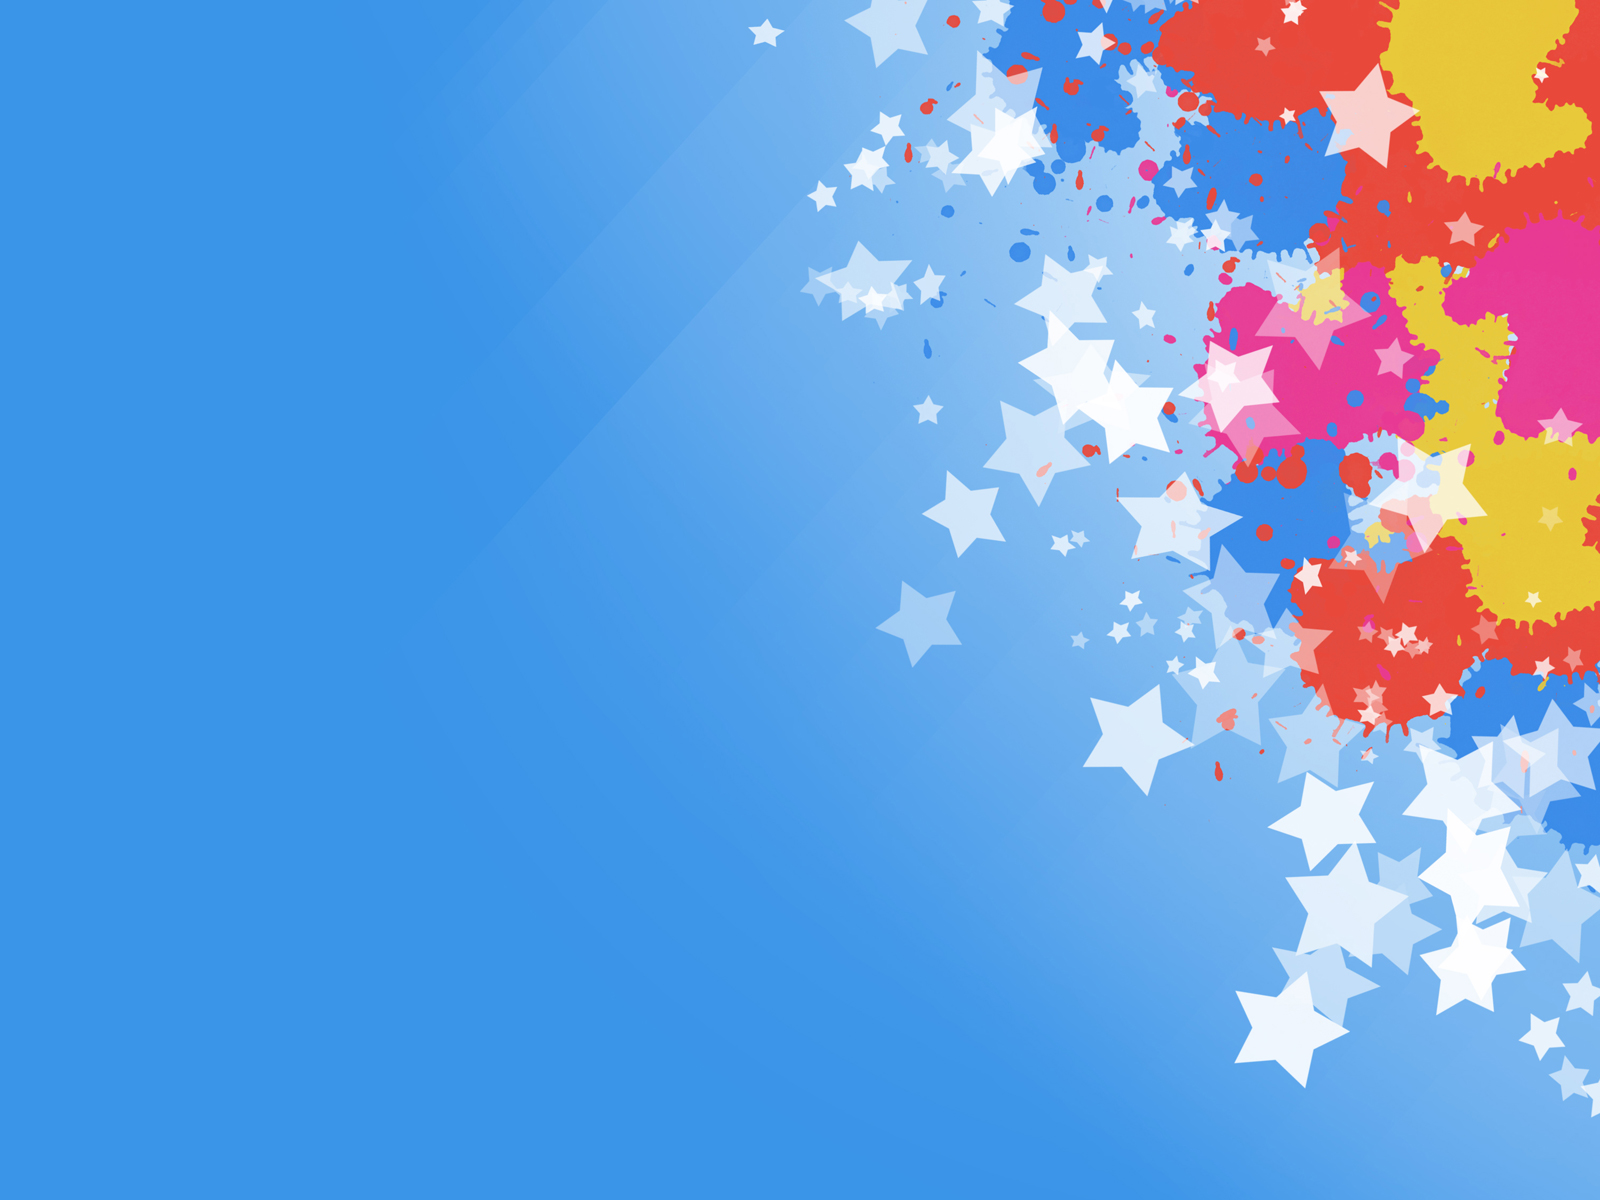 Celebration Effect PPT Backgrounds